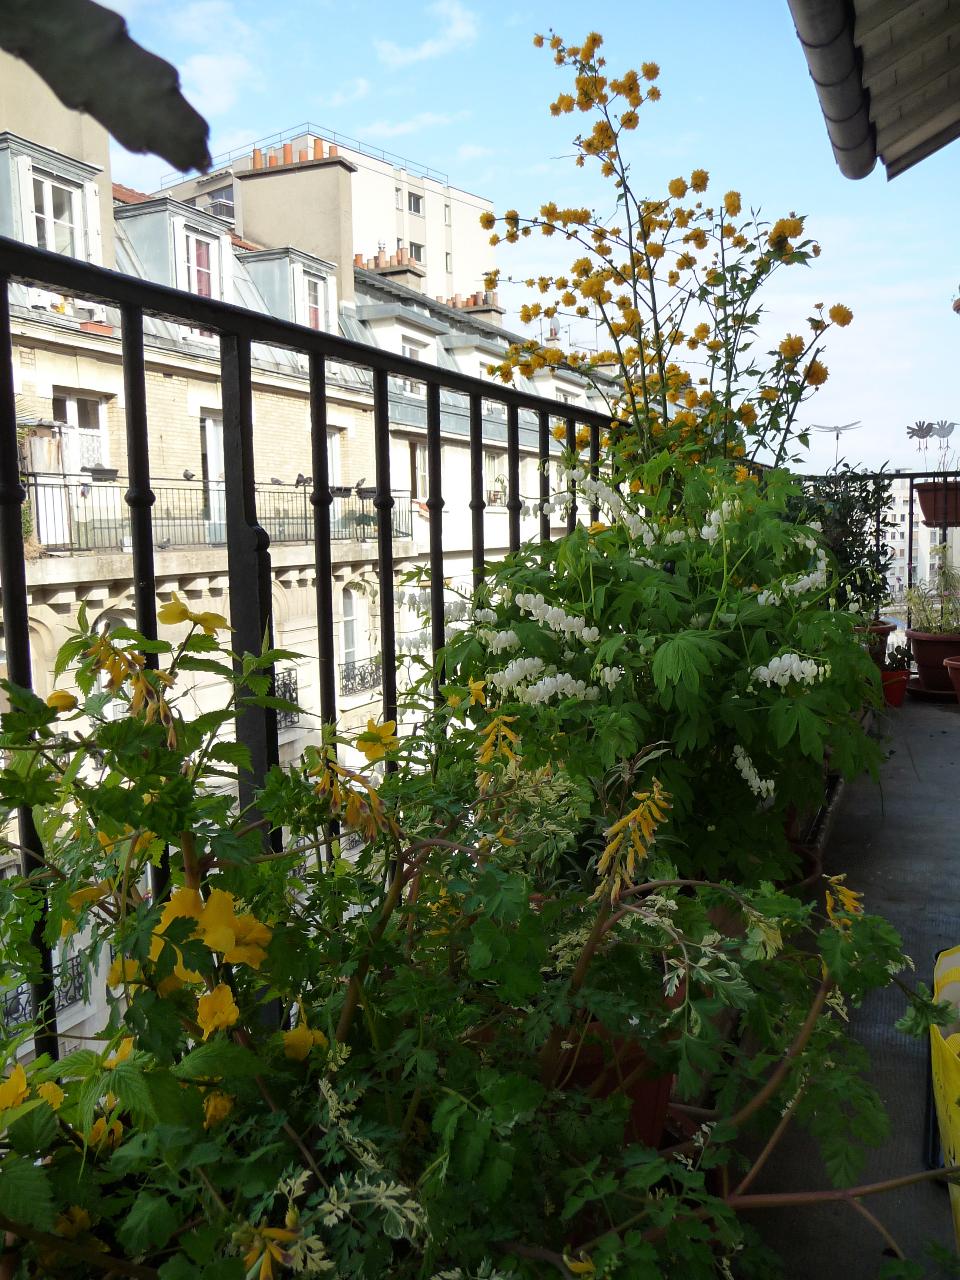 Jardin printanier sur balcon dans Paris